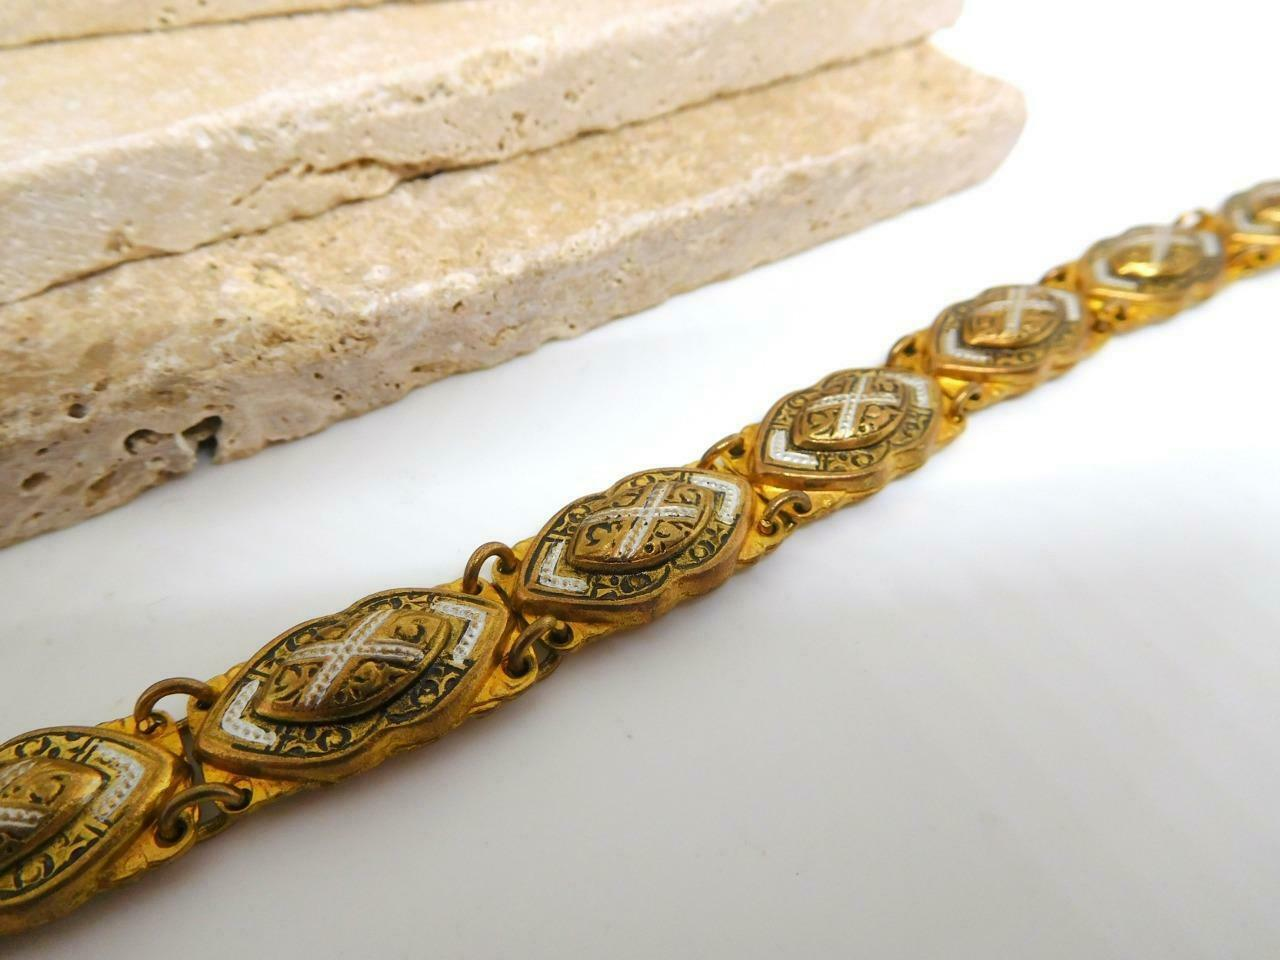 Vintage Marked Spain Gold Tone Black White Damascene Link Bracelet AA20